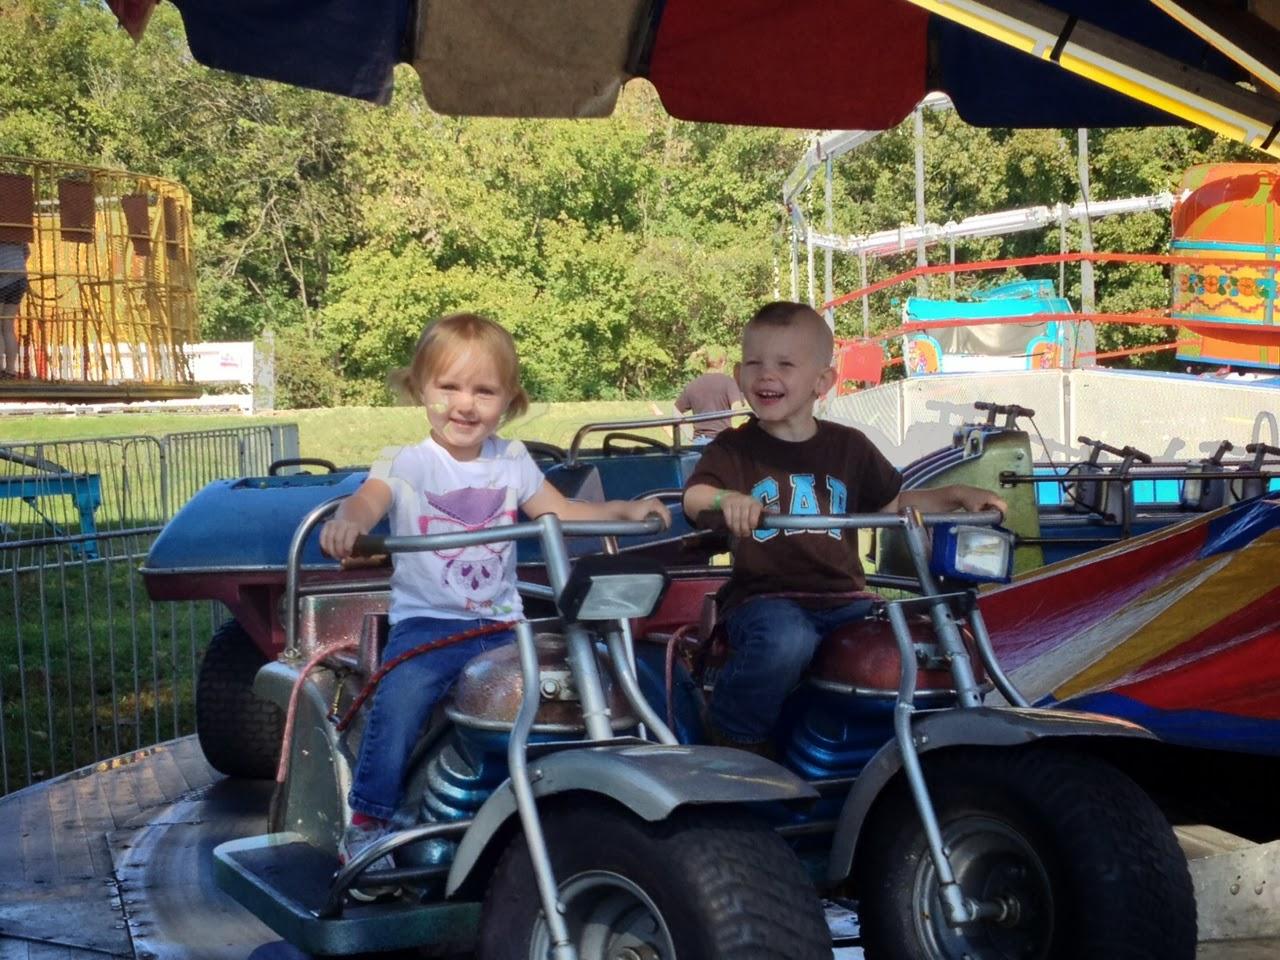 carnival-rides-1